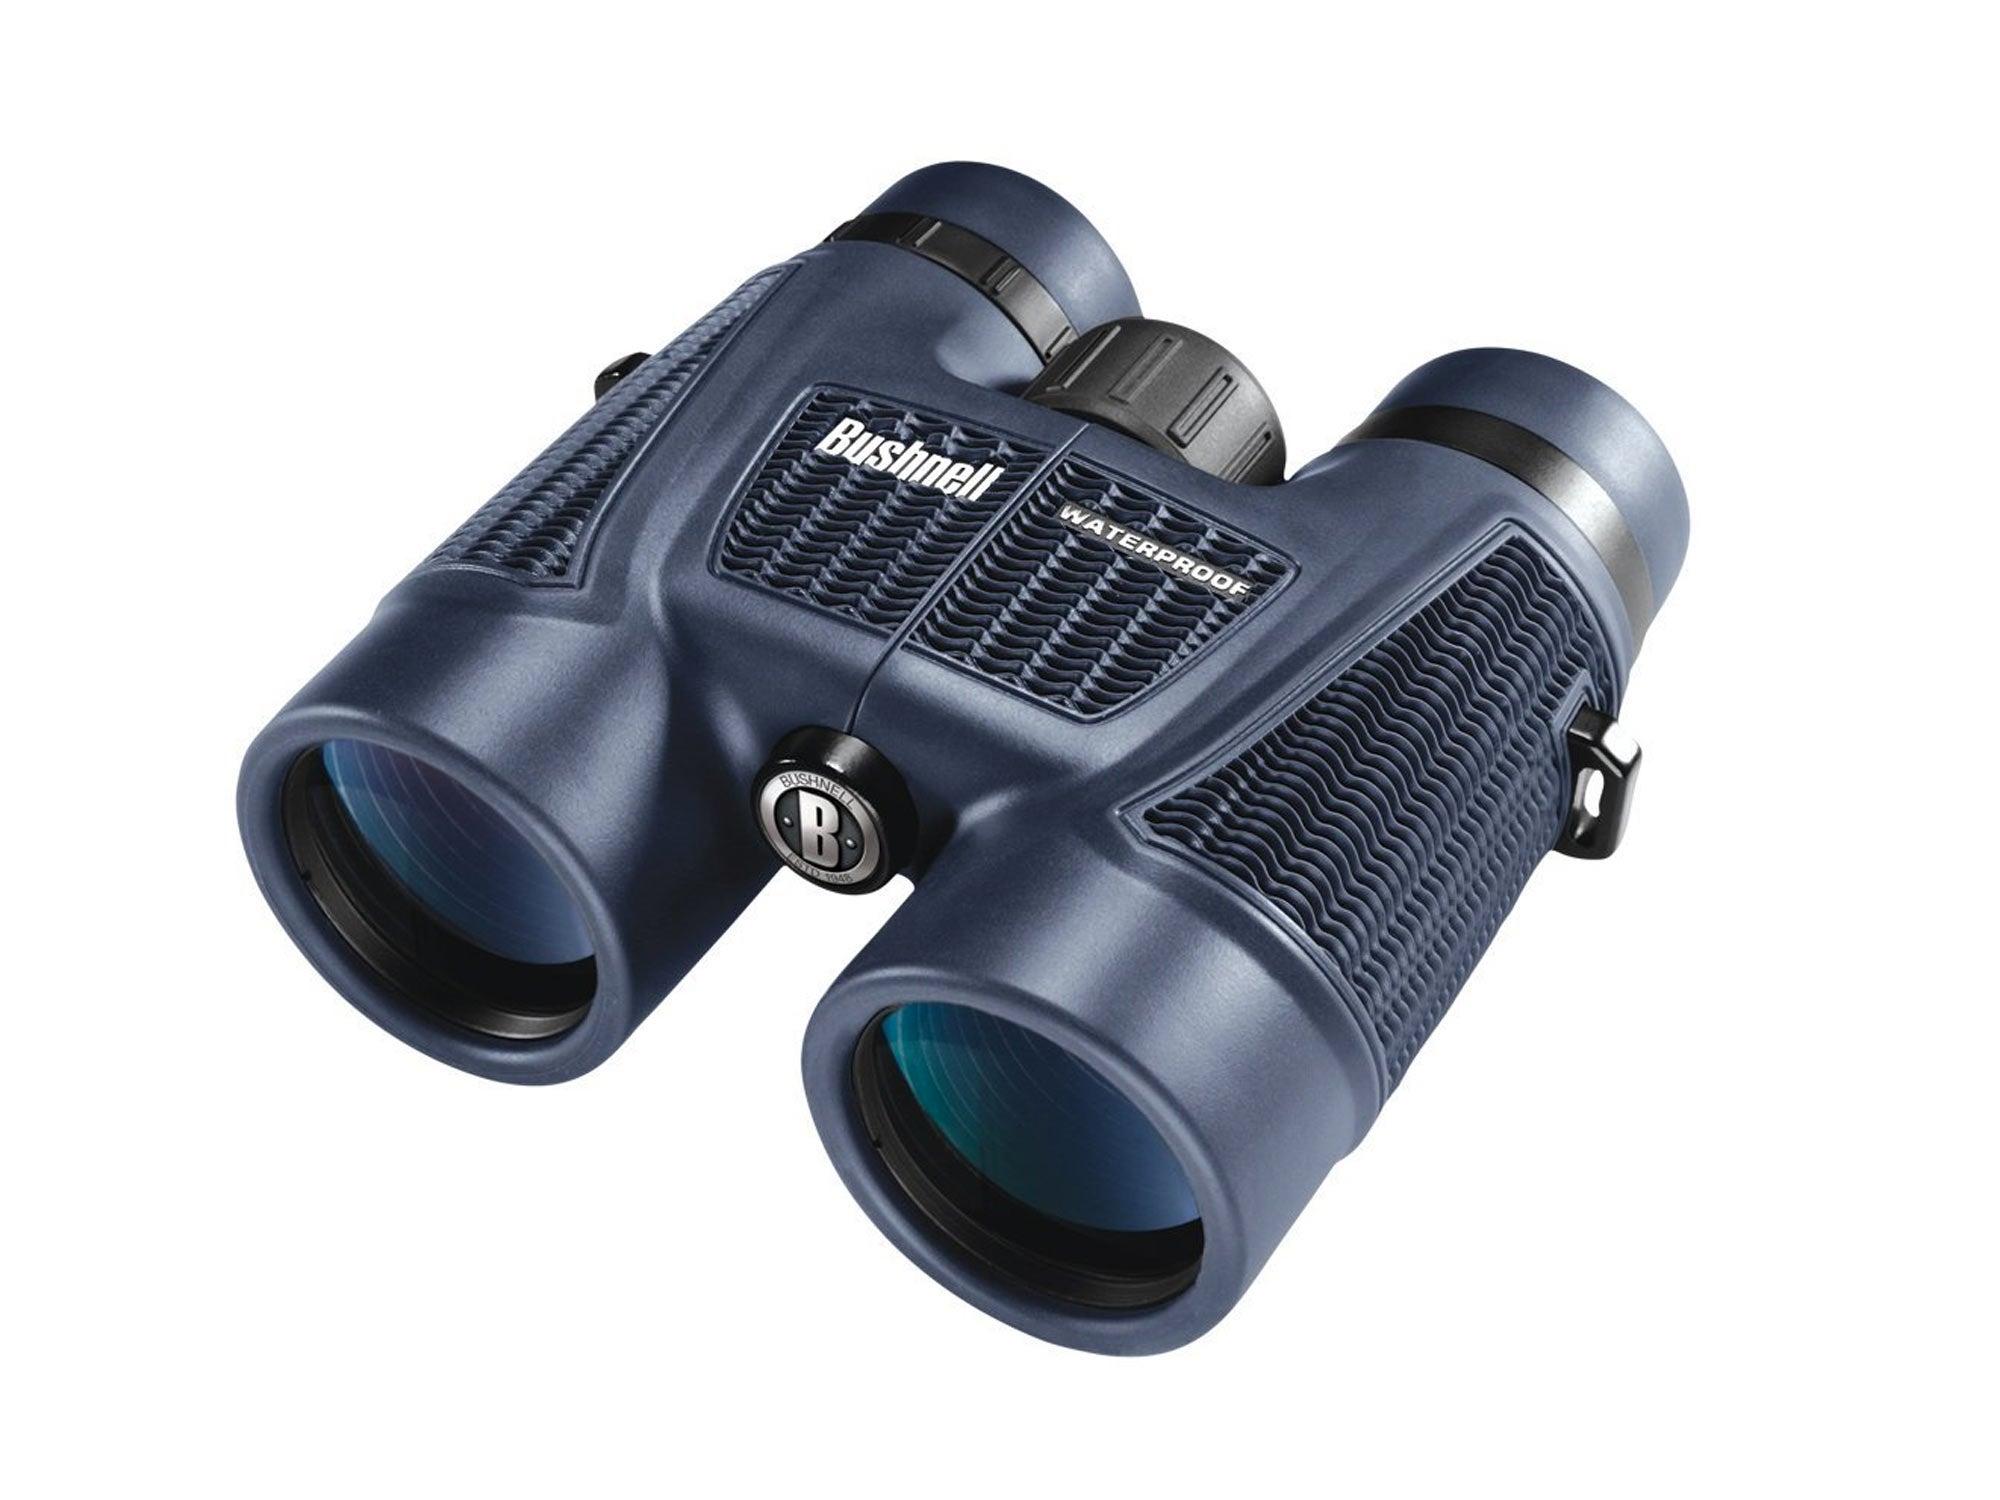 Bushnell Waterproof and Fogproof Binoculars